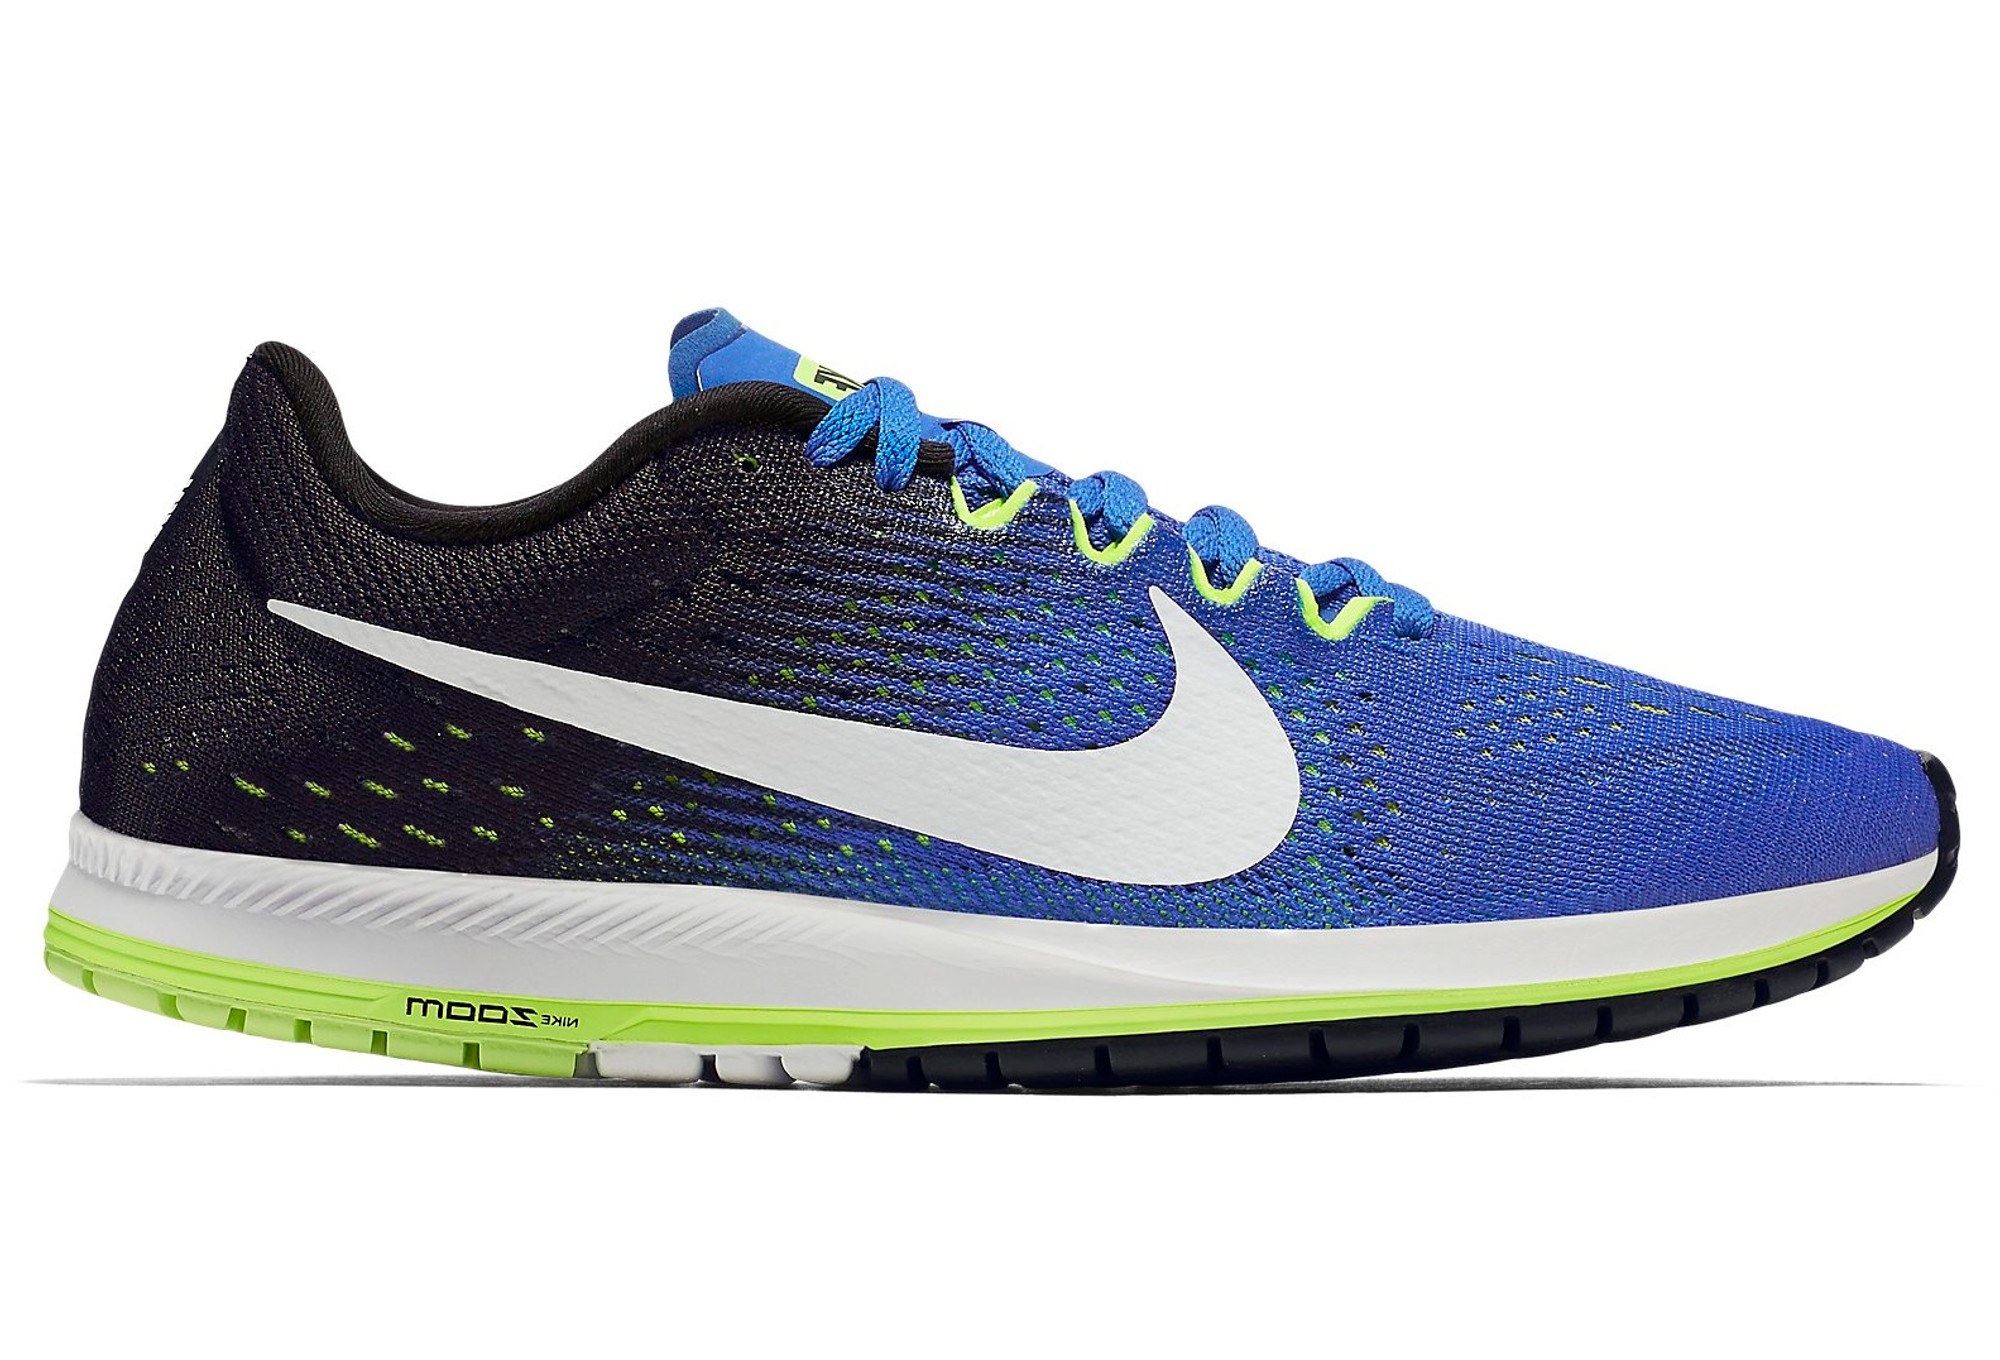 premium selection c6e38 f88ae Zapatillas Nike ZOOM STREAK 6 para Hombre Mujer Azul Negro Verde ...